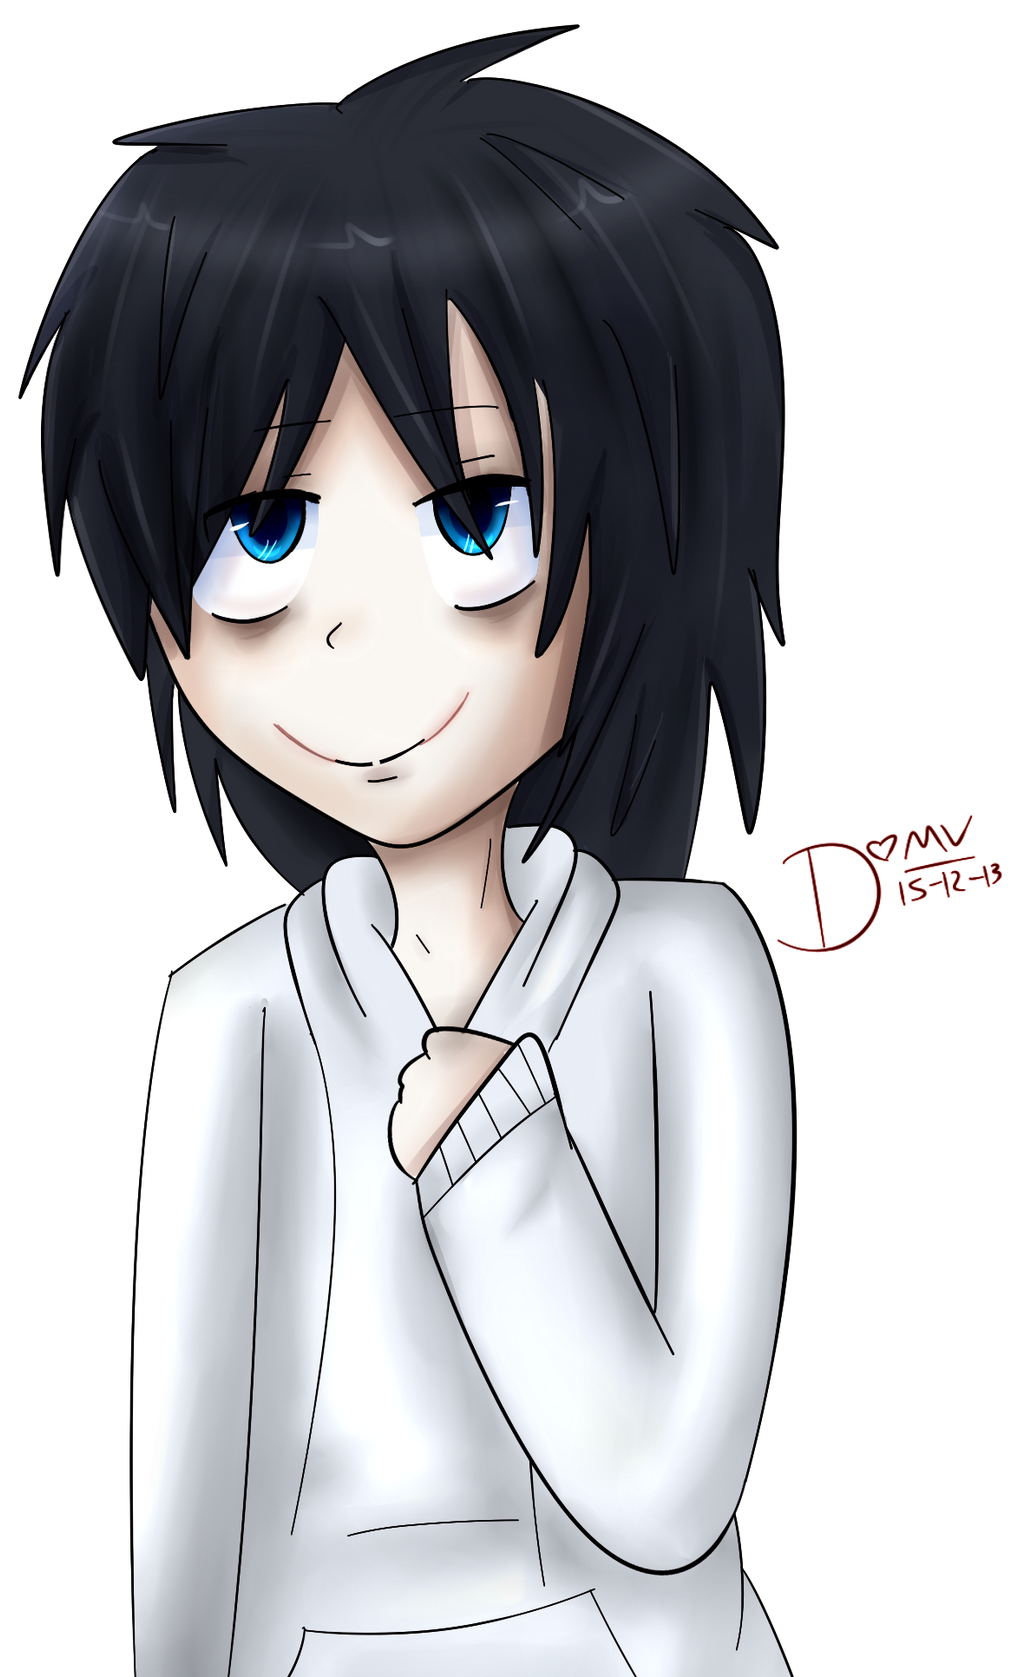 Anime jeff by ask jeff teh killer on deviantart